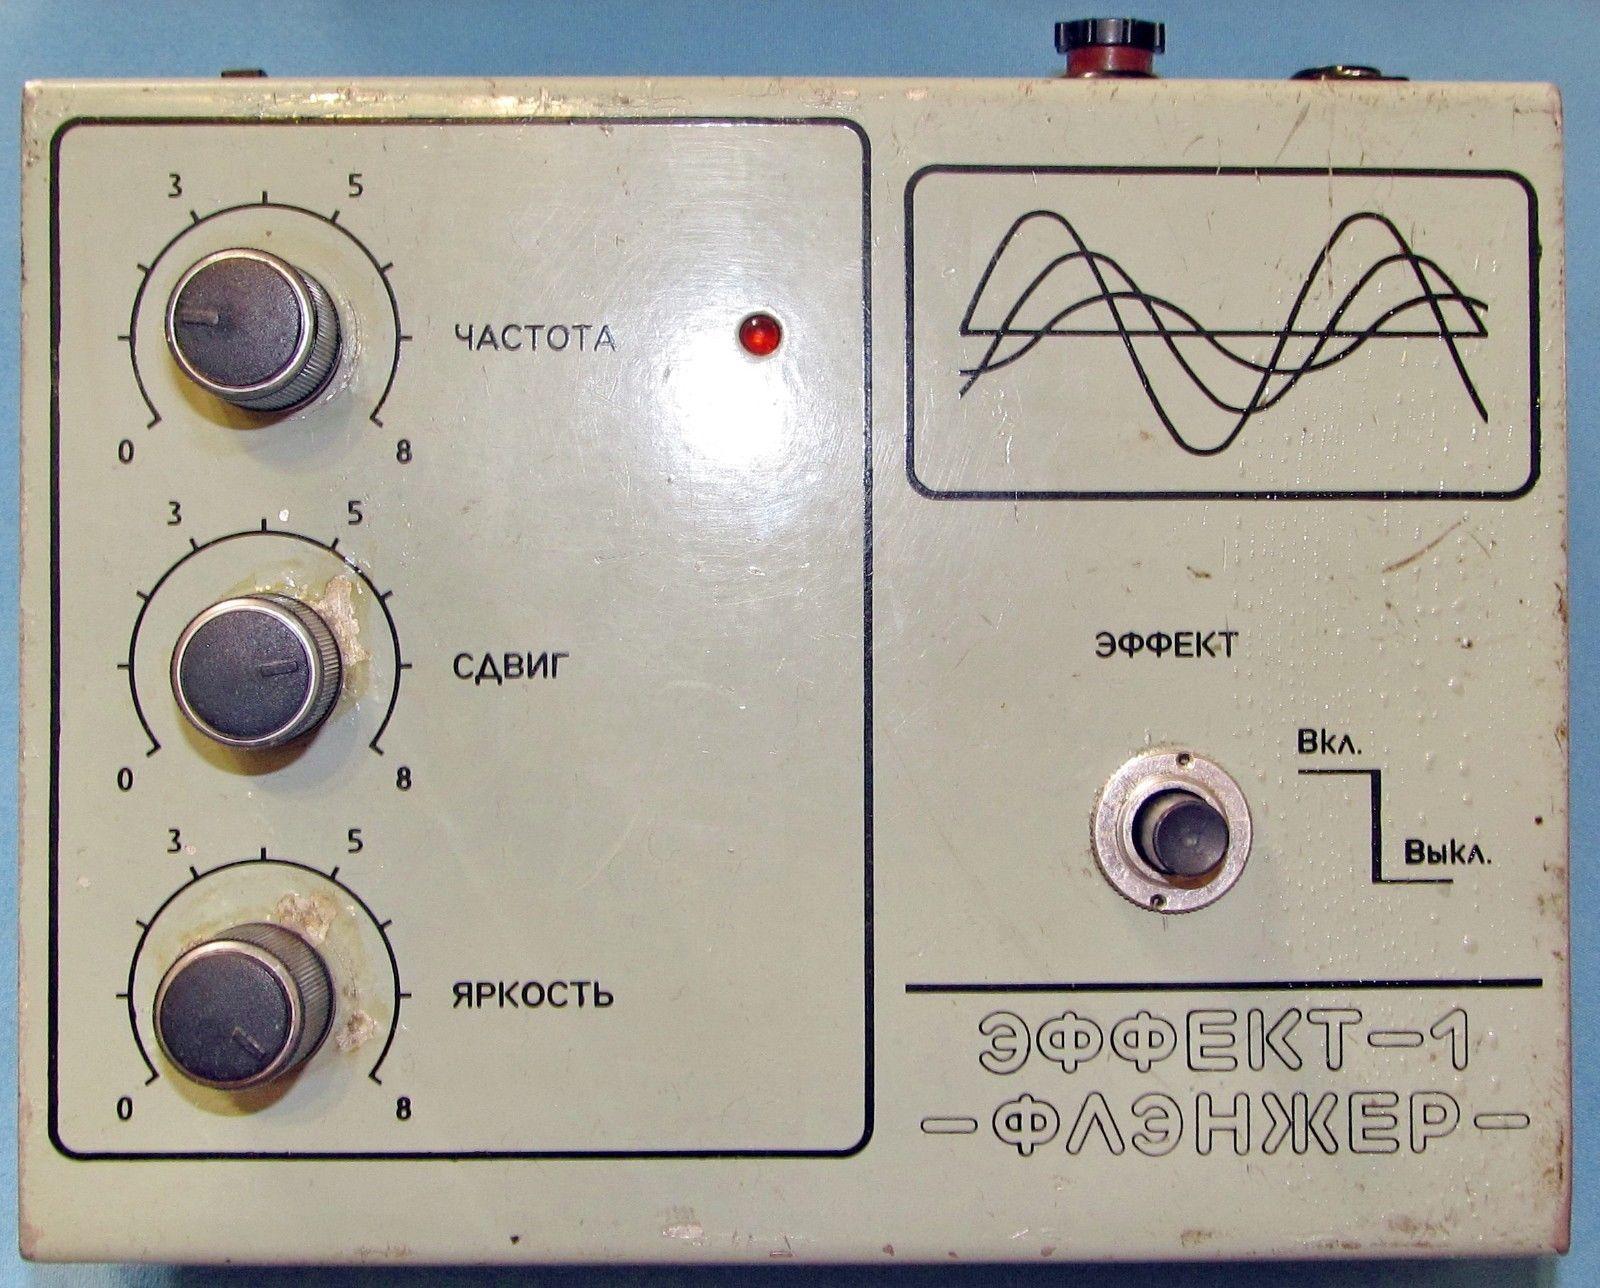 Vintage Flanger Effect 1 Estradin Ussr Russian Guitar Effect Pedal Russian Guitar Effects Pedals Guitar Effects